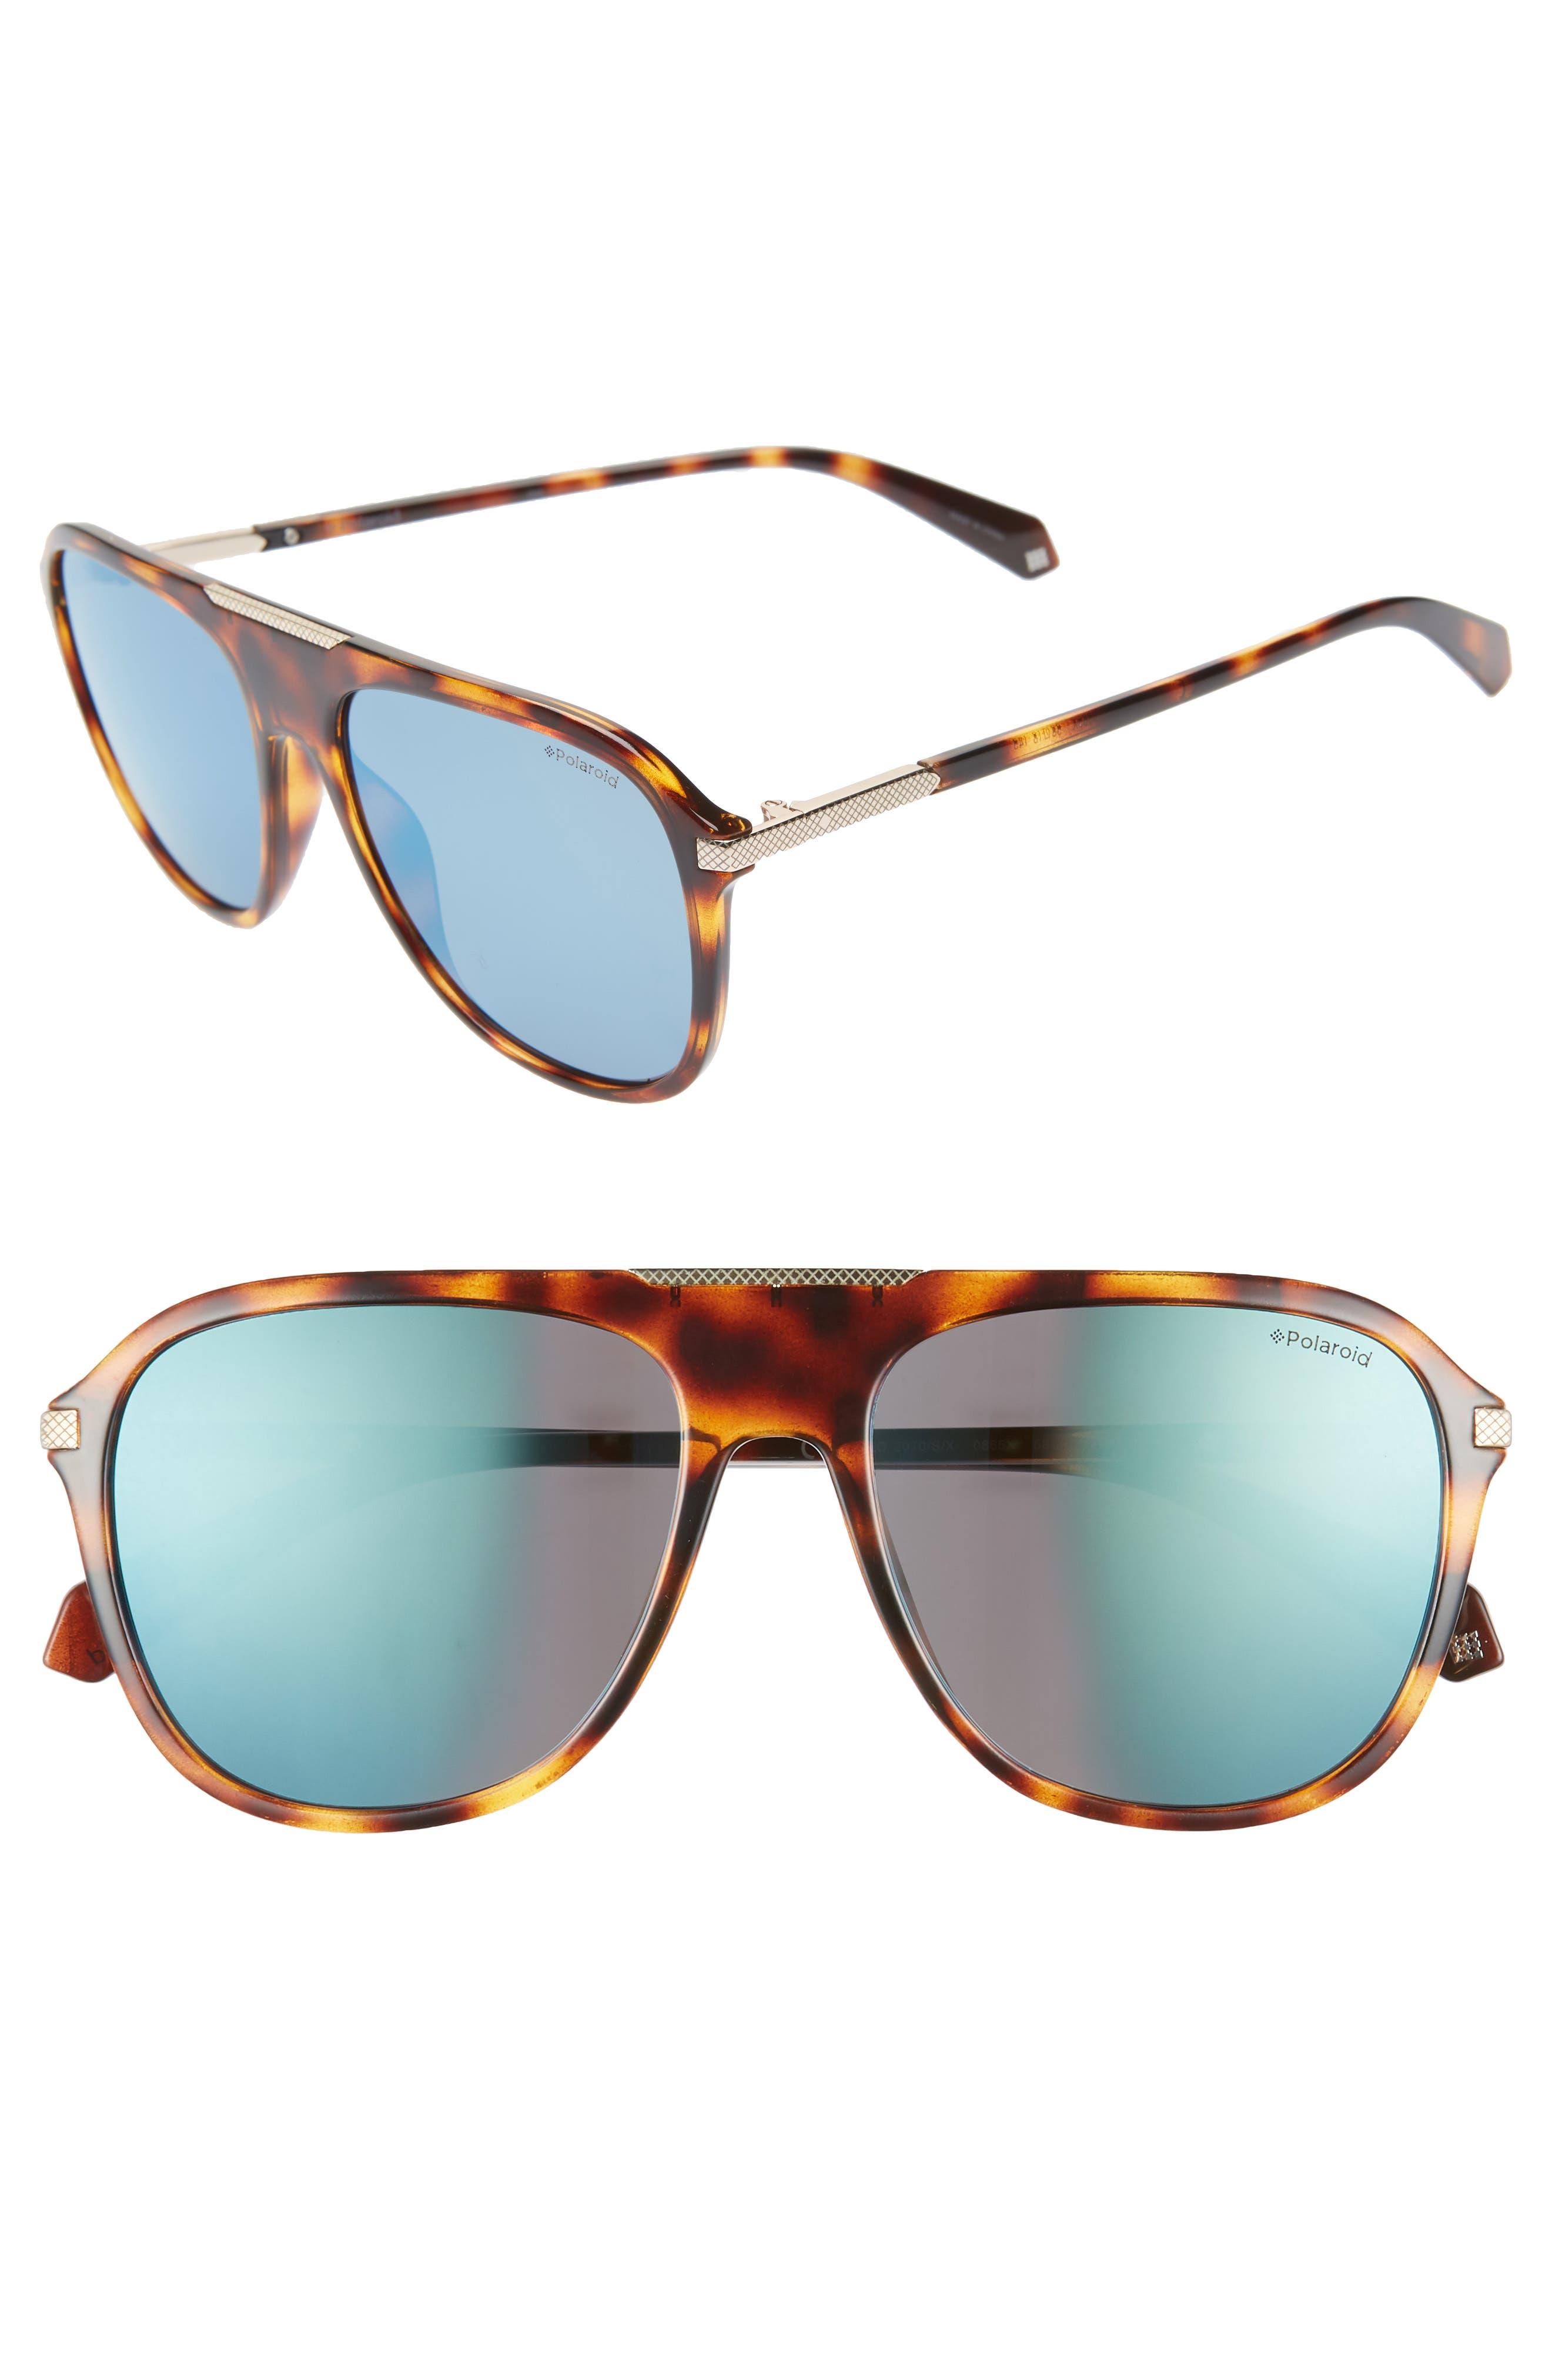 POLAROID 58Mm Polarized Aviator Sunglasses - Havana